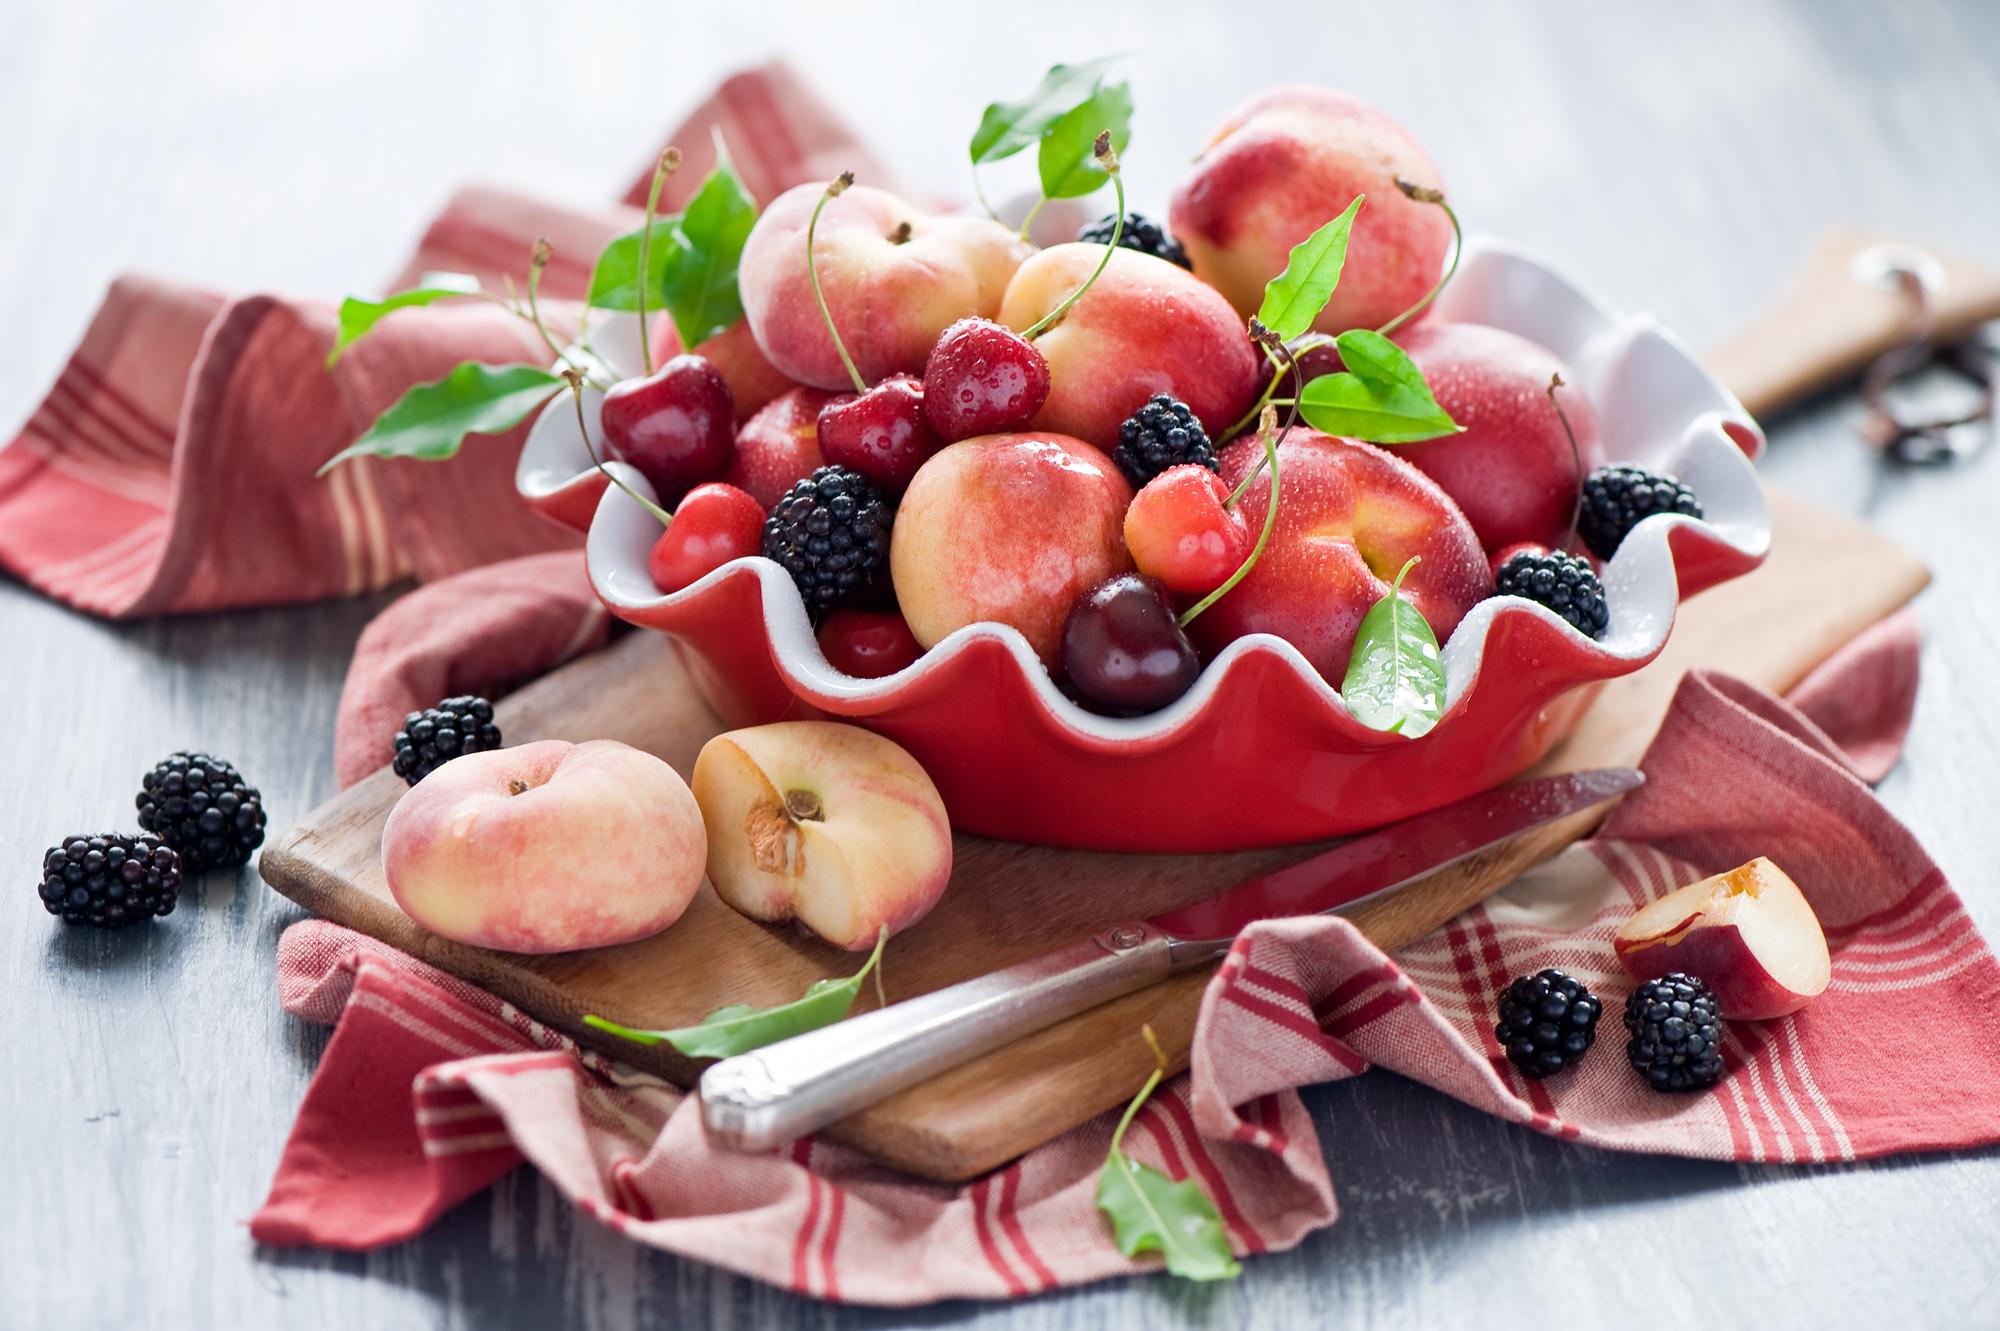 wallpaper fresh fruits berries - photo #6